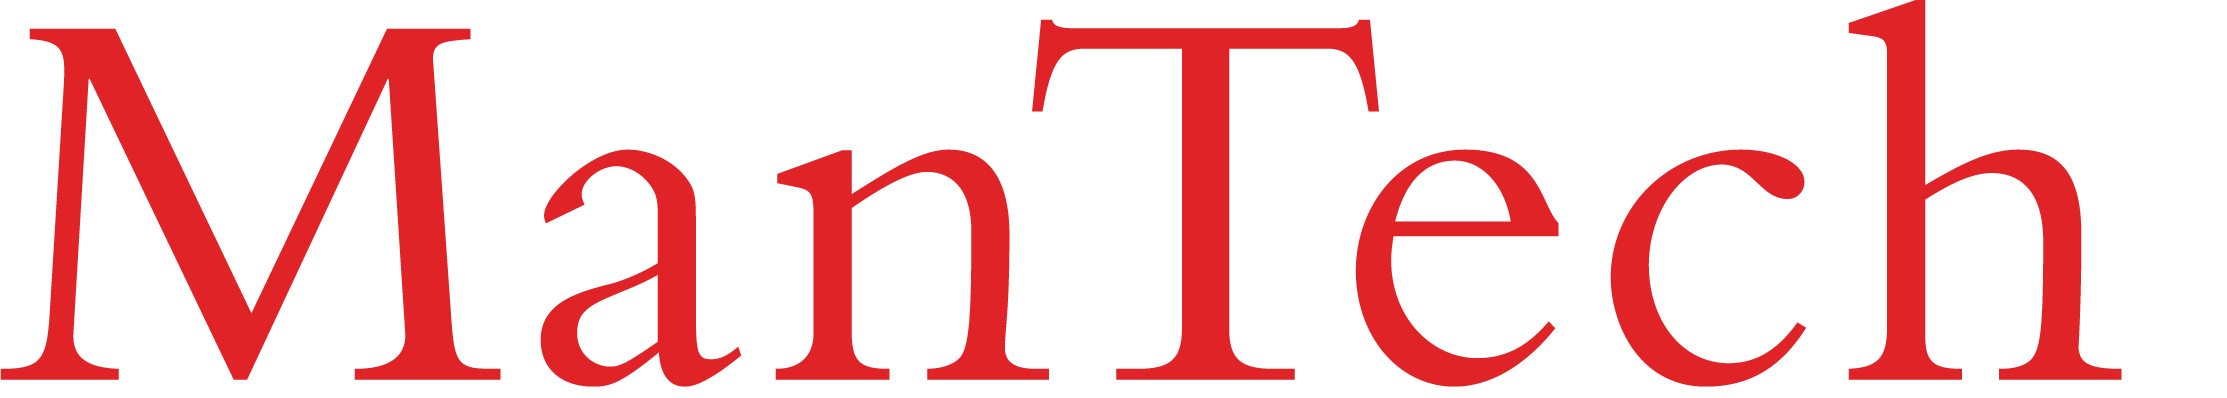 mantech-only-logo